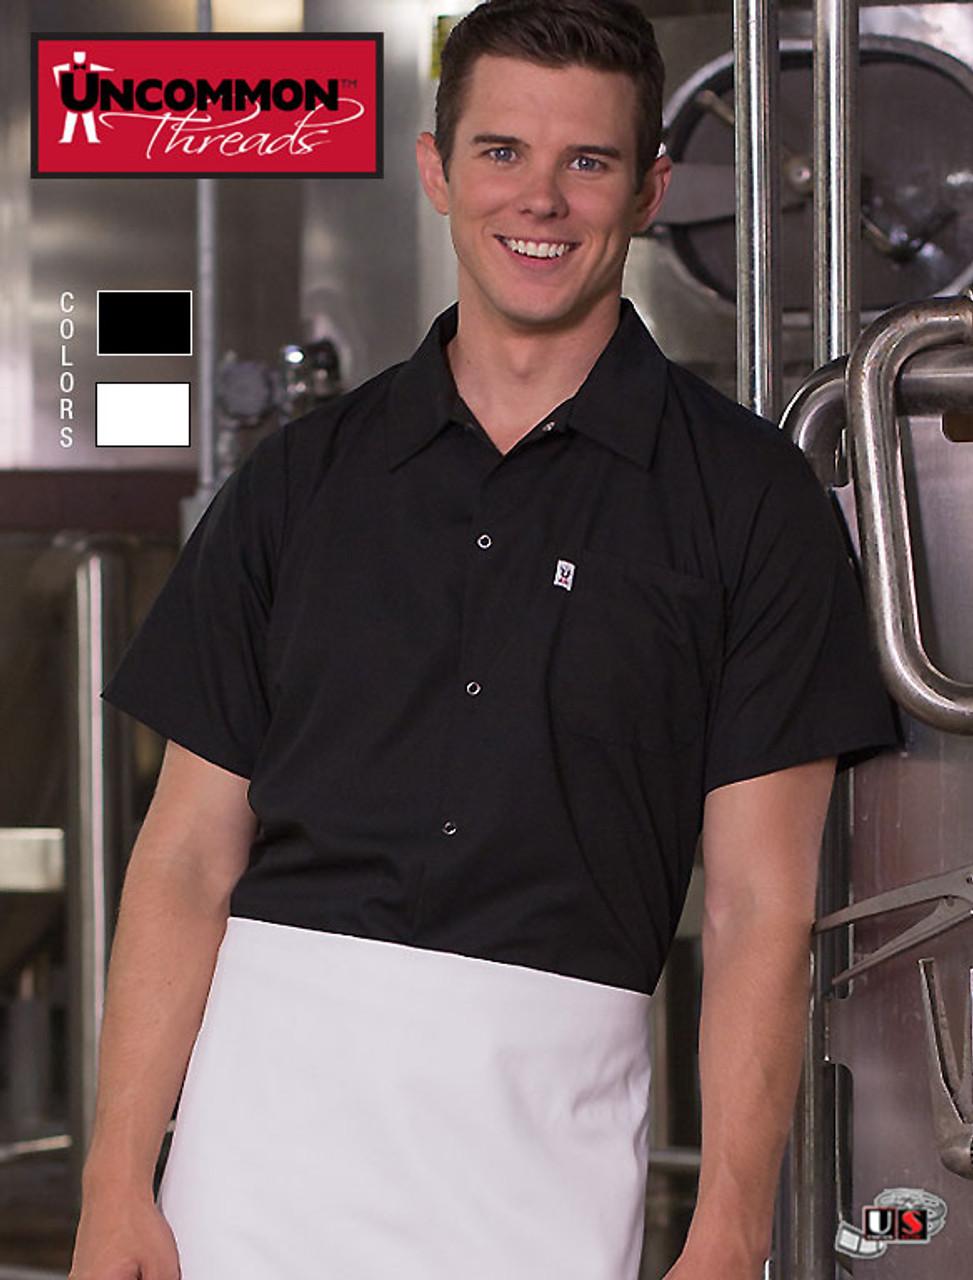 Uncommon Threads Snap Chef Utility Shirt 0950 Sizes XS to 2XL Black or White